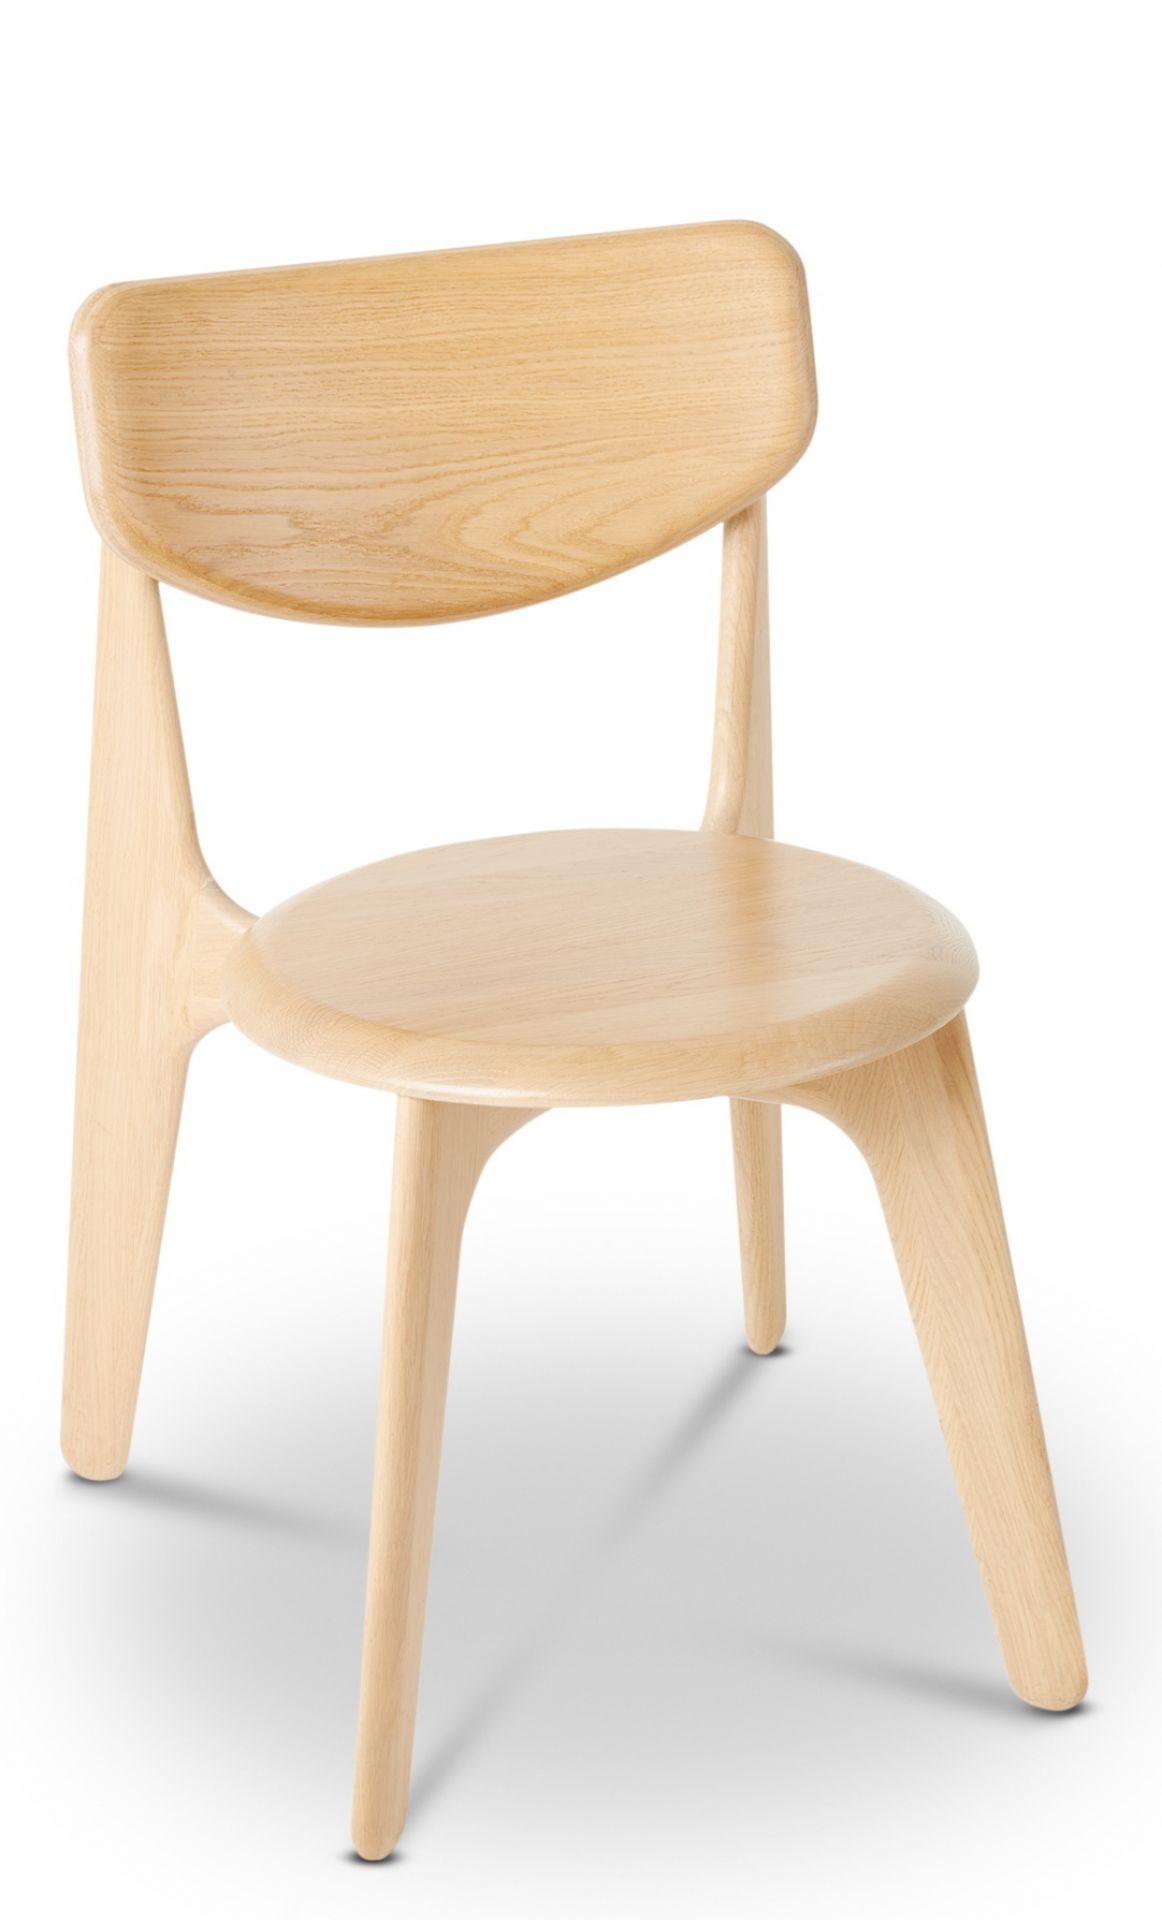 Slab Chair Stuhl Tom Dixon natur